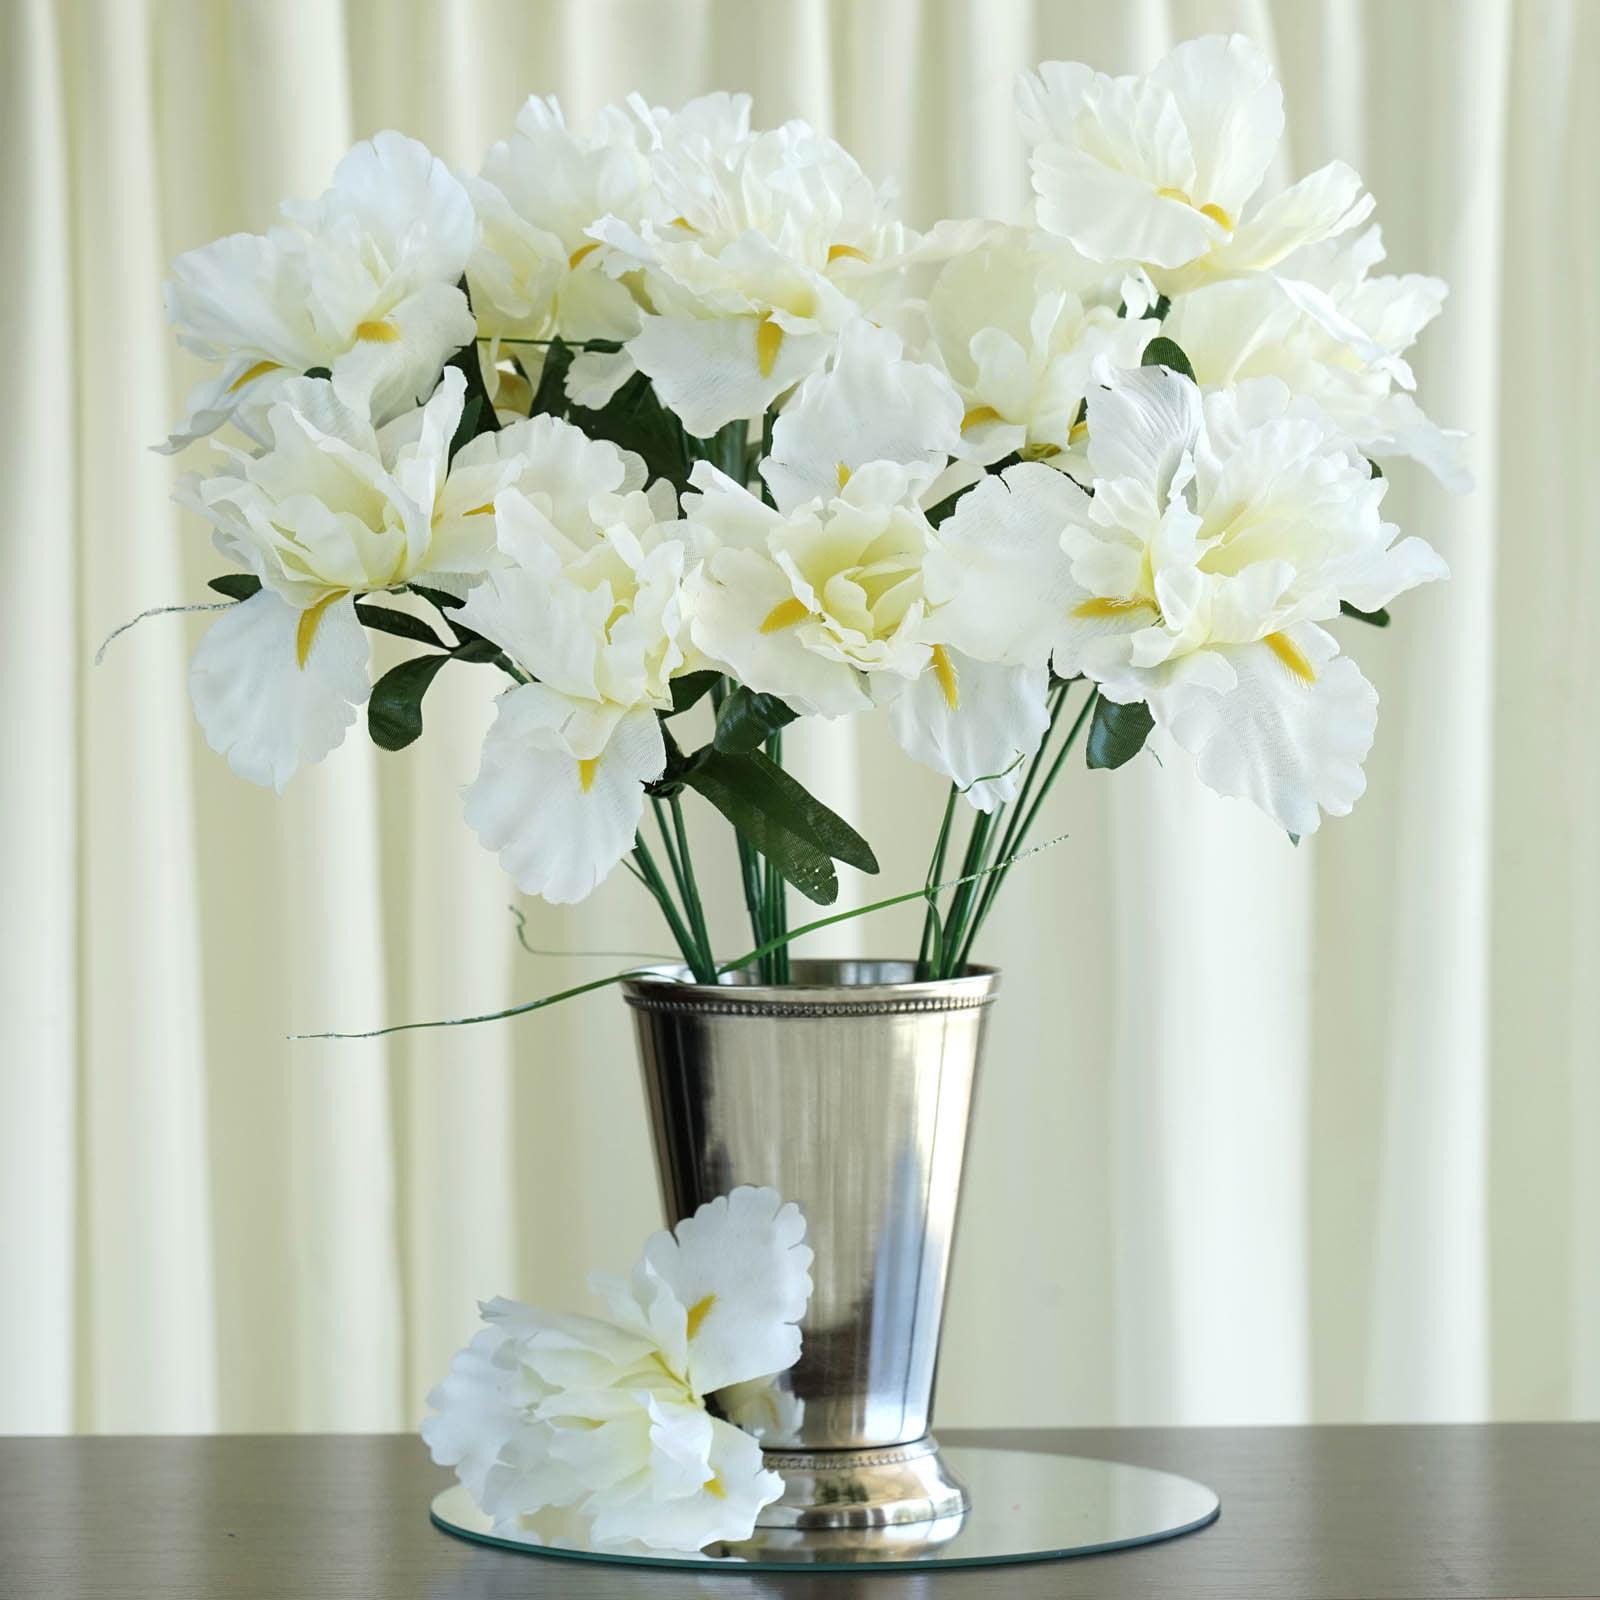 Efavormart 60 Pcs Artificial Iris Flowers For Diy Wedding Bouquet